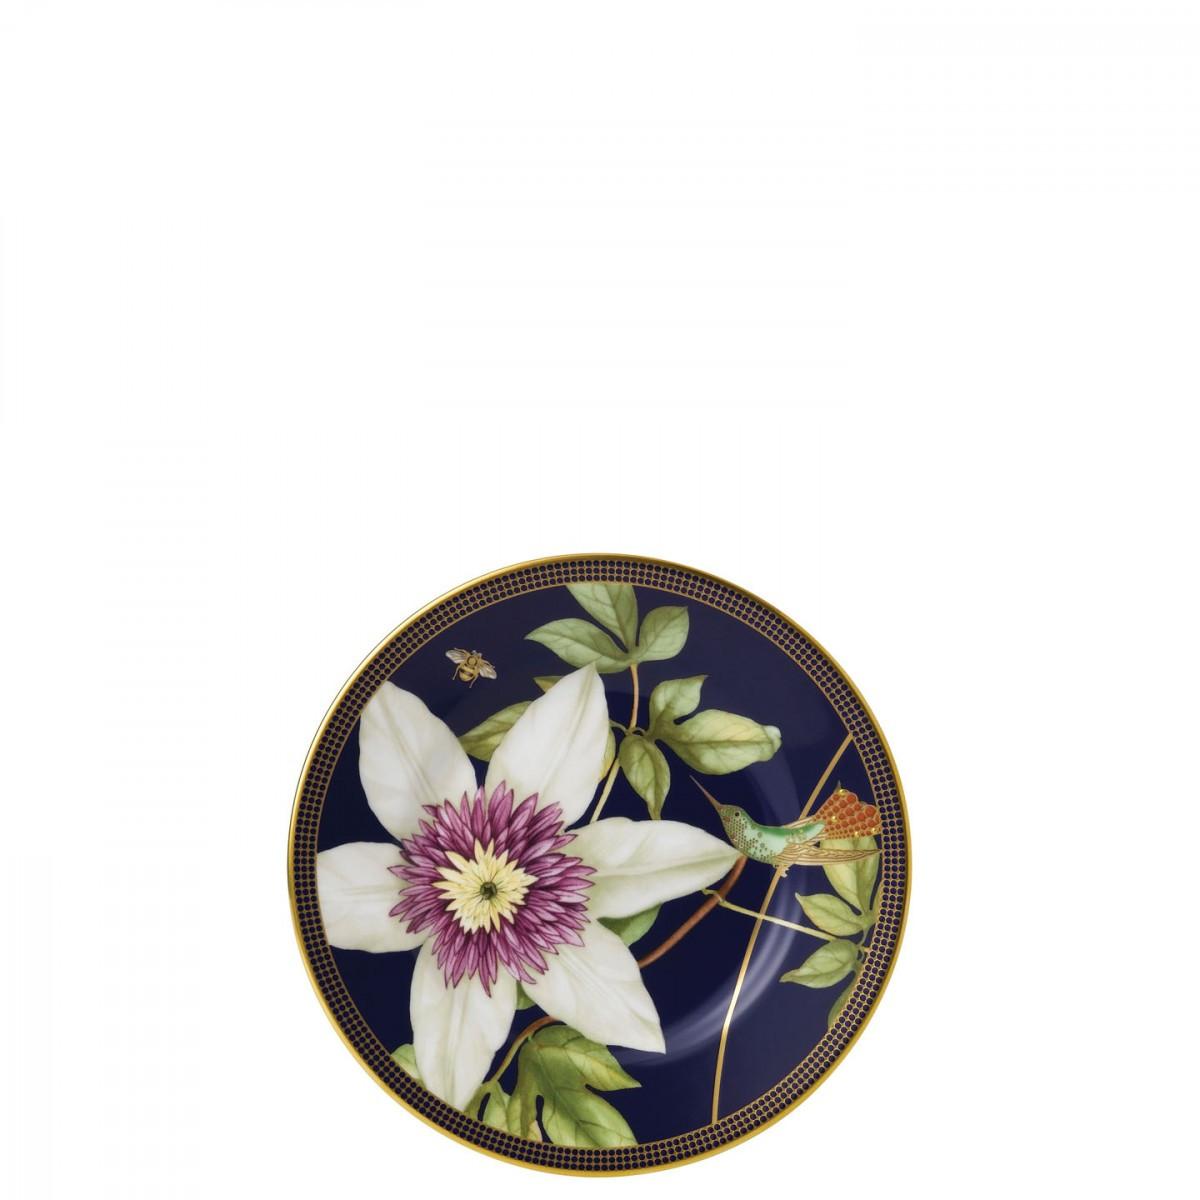 wedgwood bone china wild strawberry vase of hummingbird plate 15cm wedgwooda uk with hummingbird plate 15cm